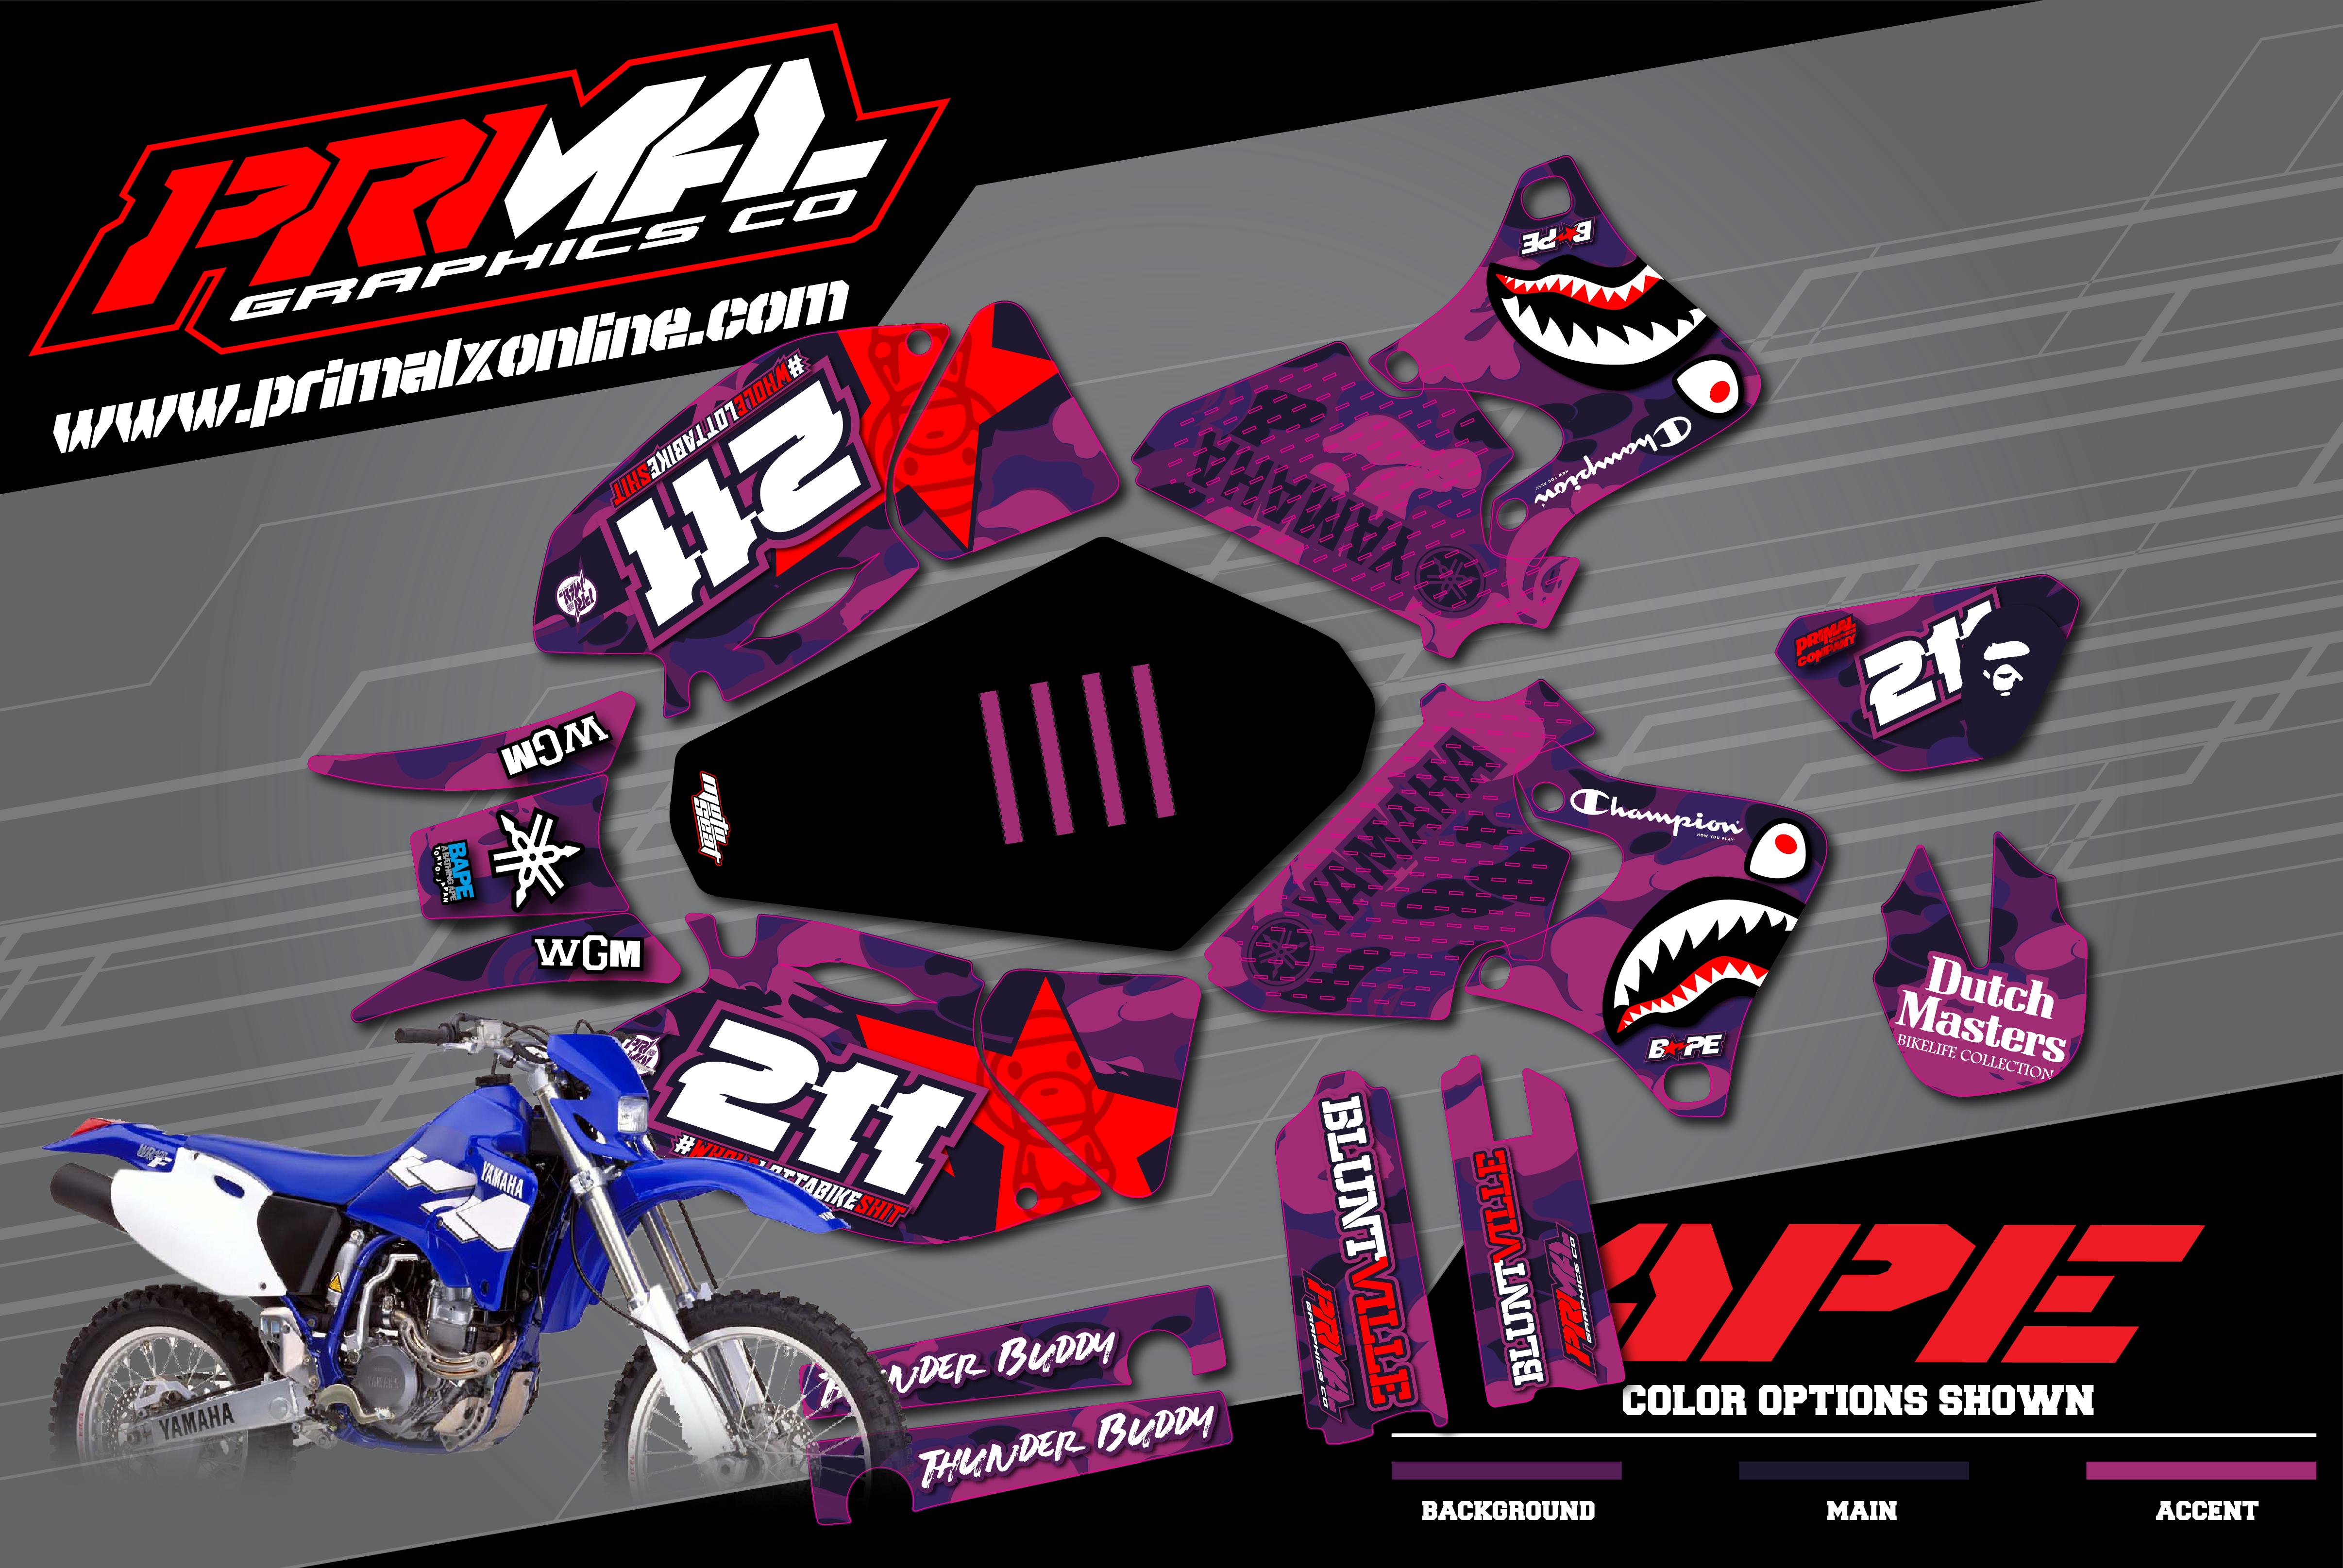 PRIMAL-X-MOTORSPORTS-PRIMAL-GRAPHICS-CO-YAMAHA-WRF-WR400-ATV-GRAPHICS-MX-GRAPHICS-MX-DECALS-QUAD-GRAPHICS-APE-SERIES-01-01